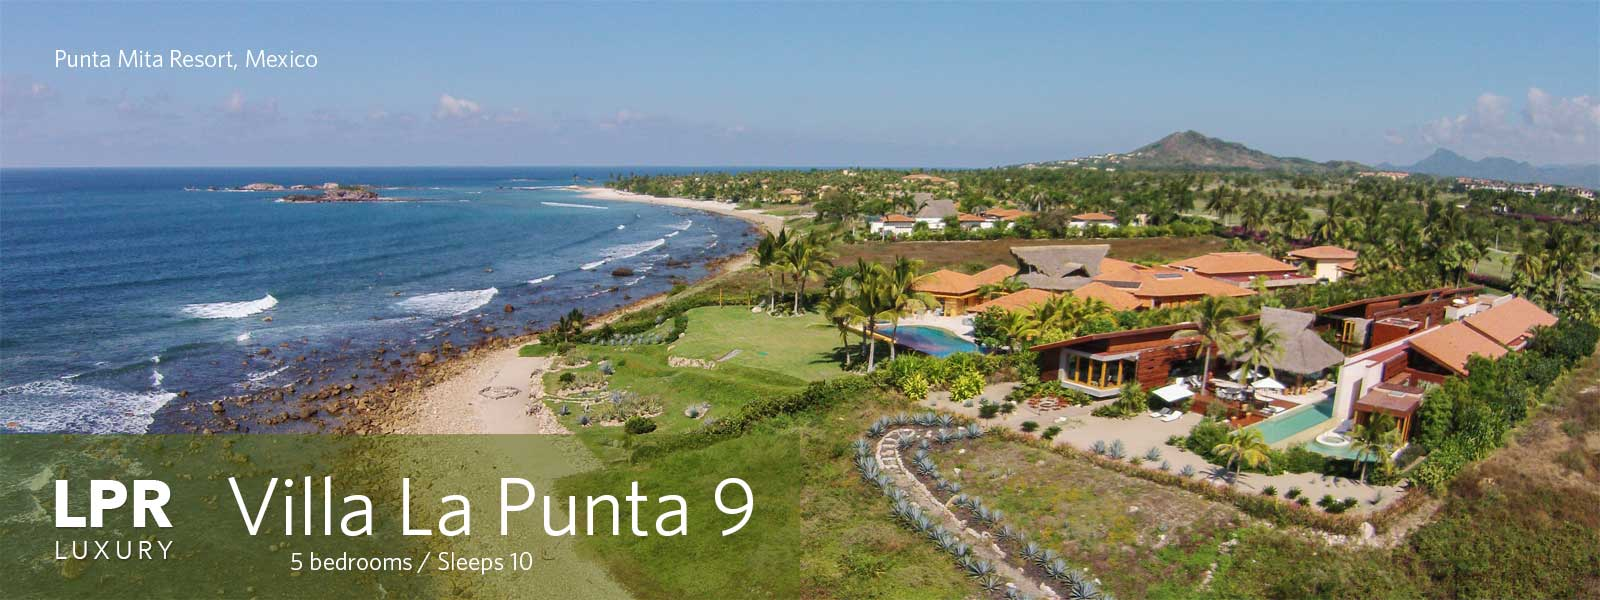 Villa la Punta 9 - La Punta Estates - Punta Mita Resort, Riviera Nayarit Mexico